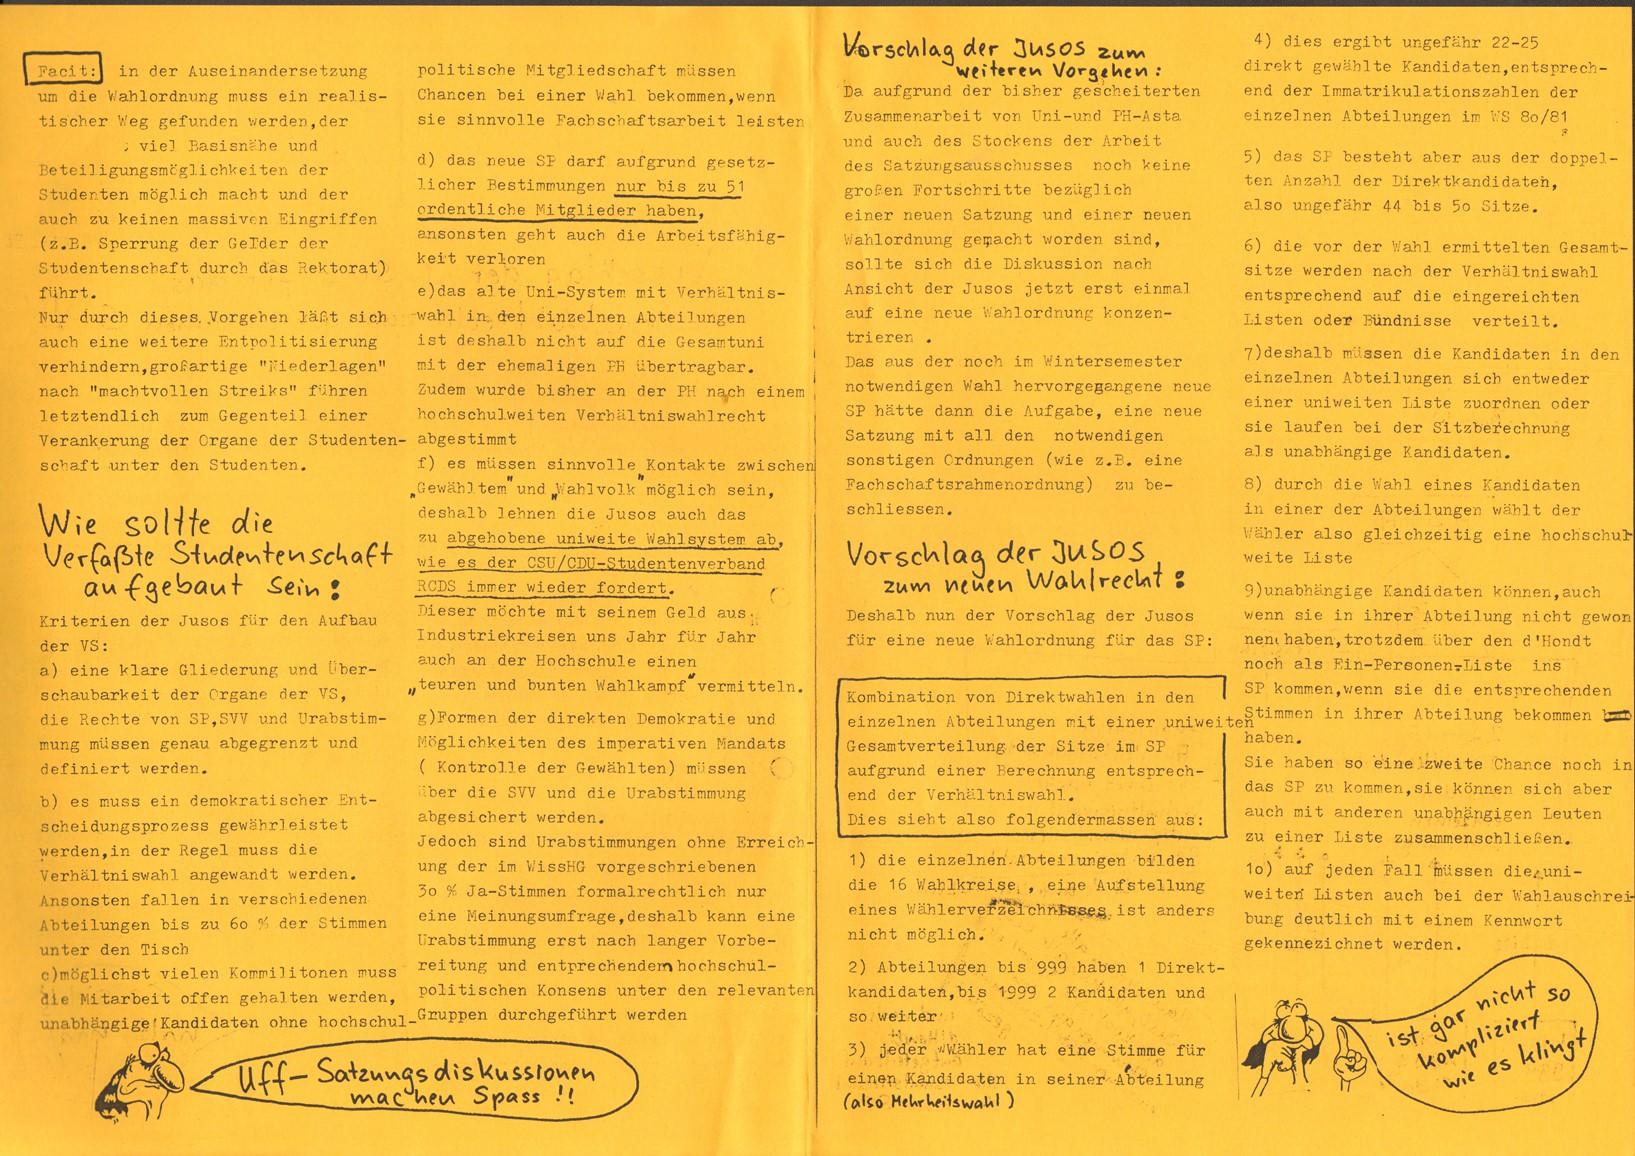 Dortmund_JUSO_HSG_1980_002_02